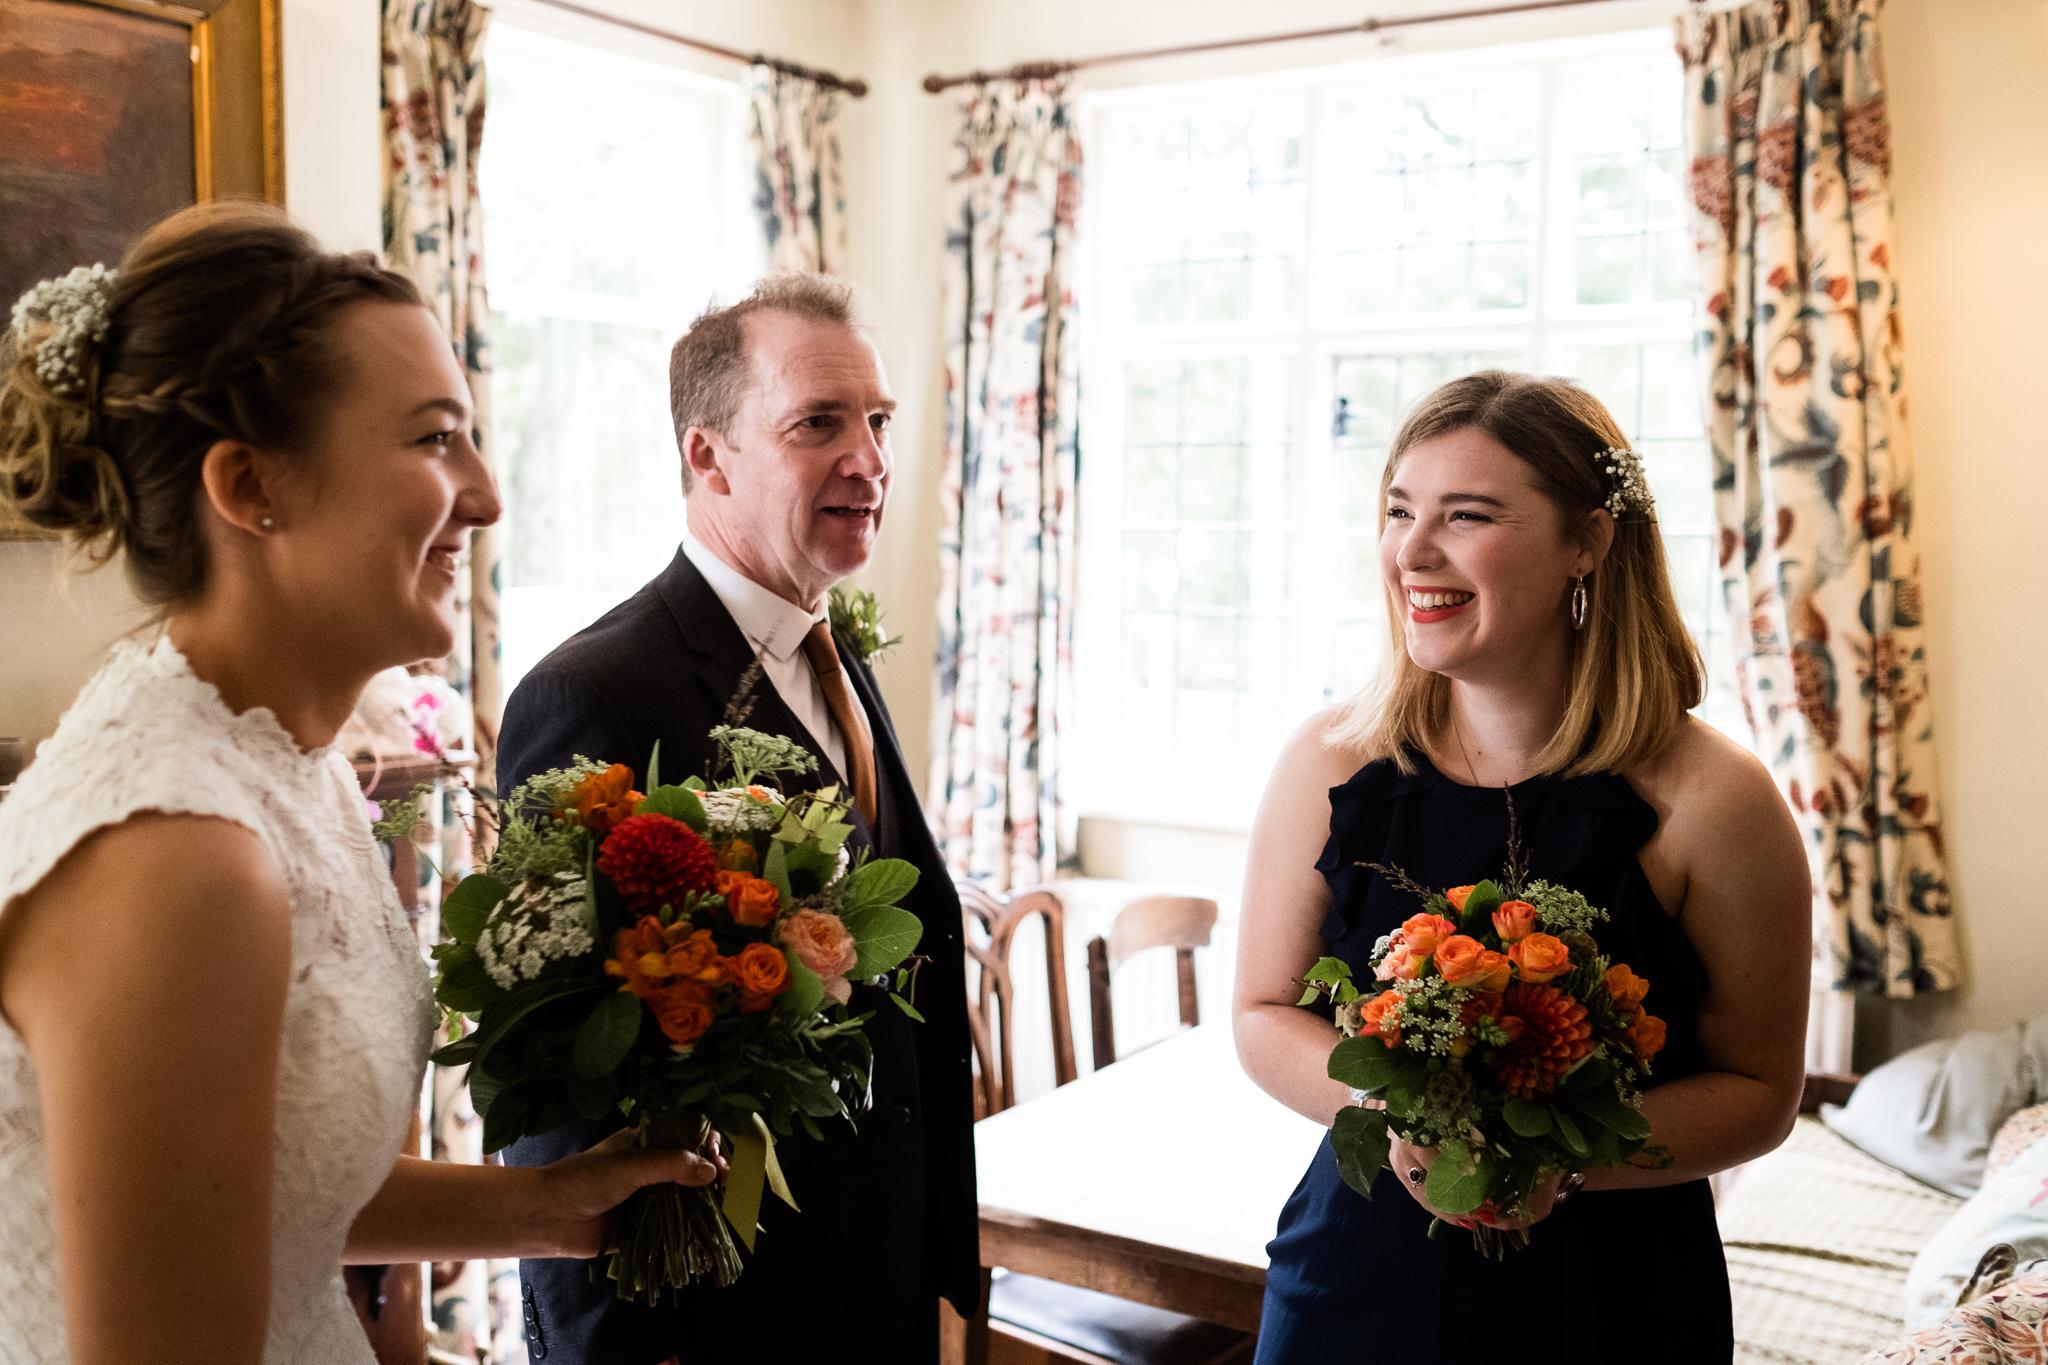 Relaxed Documentary Wedding Photography at The Wizard Inn, Alderley Edge Cheshire - Jenny Harper-17.jpg